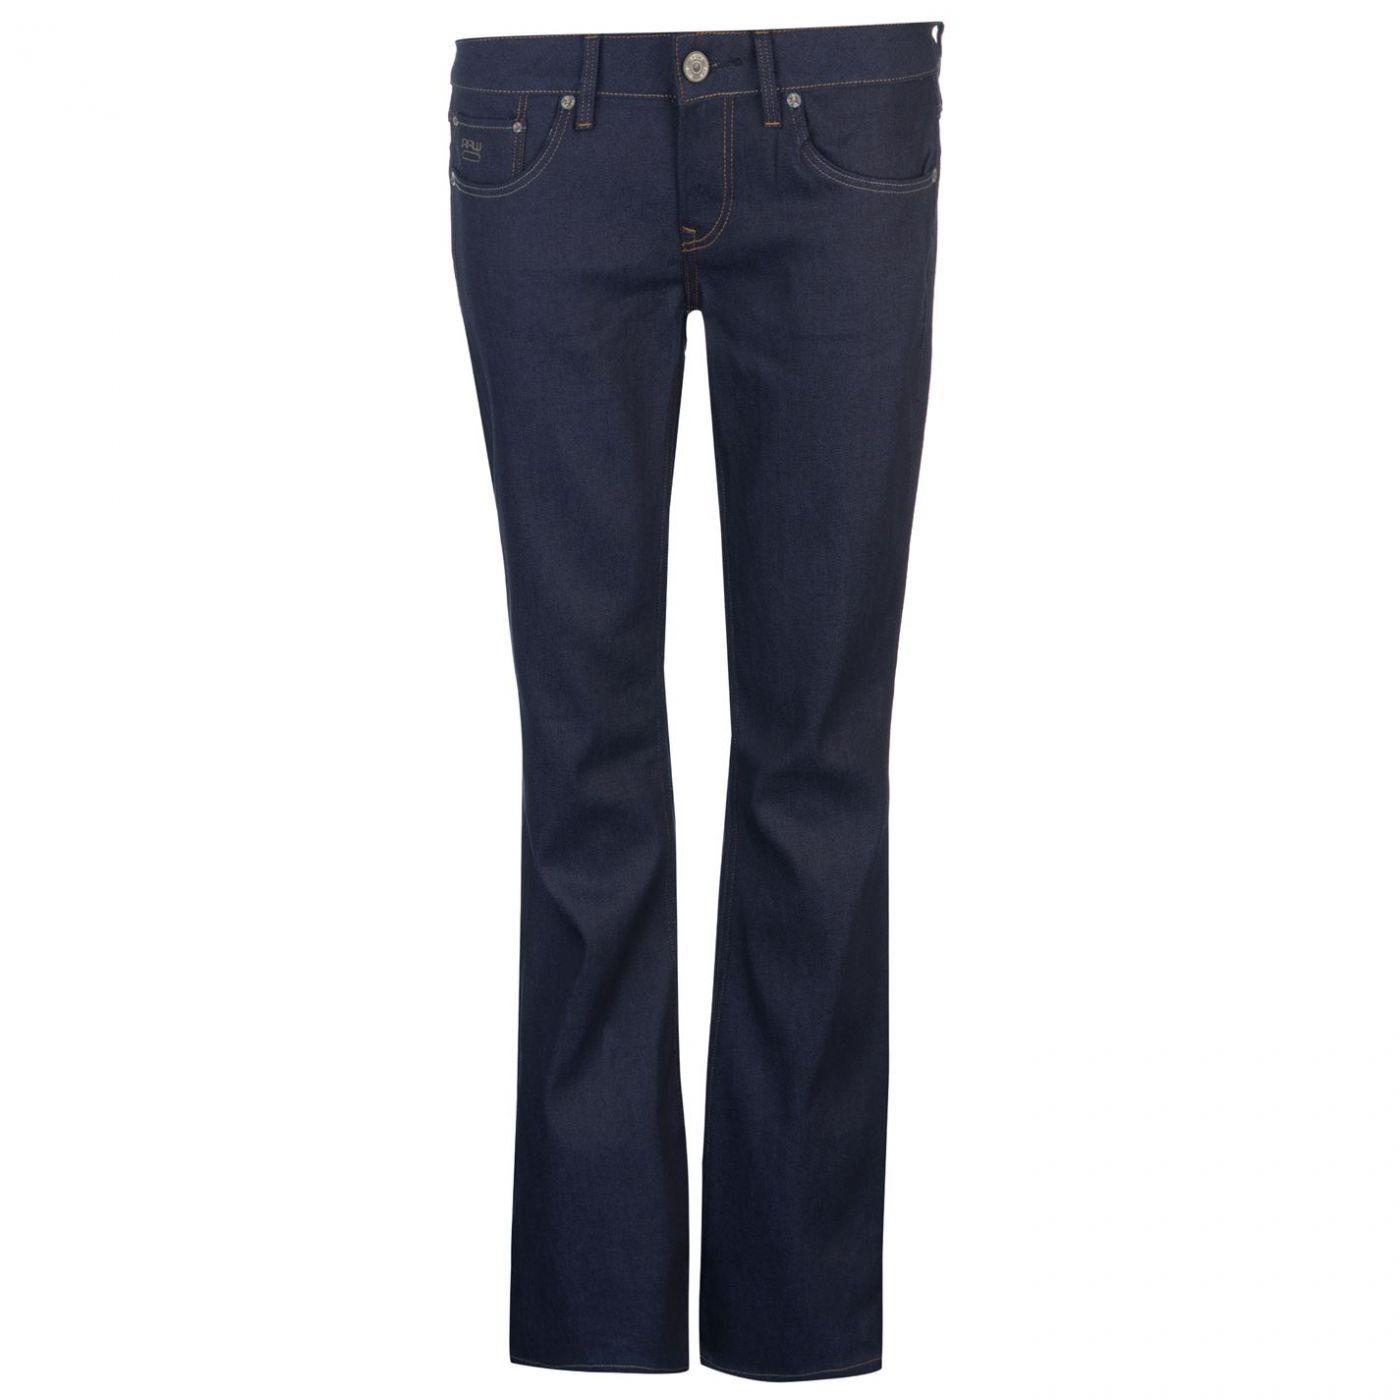 G Star 60523 Boot Cut Jeans